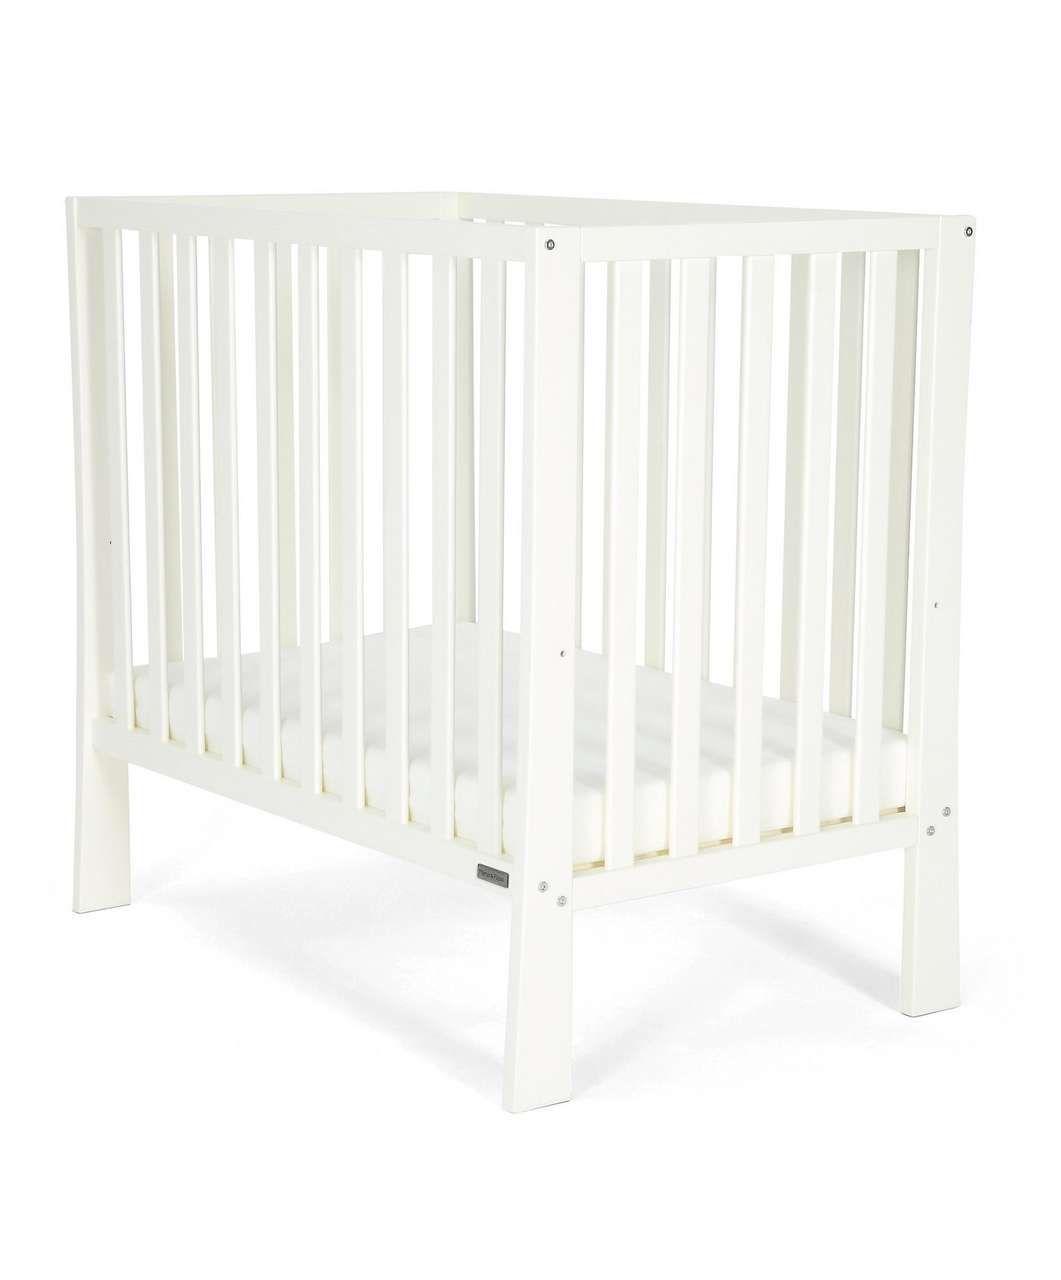 timeless design ff3db 8507e Petite Cot - White - Cot Beds, Cots & Cribs - Mamas & Papas ...